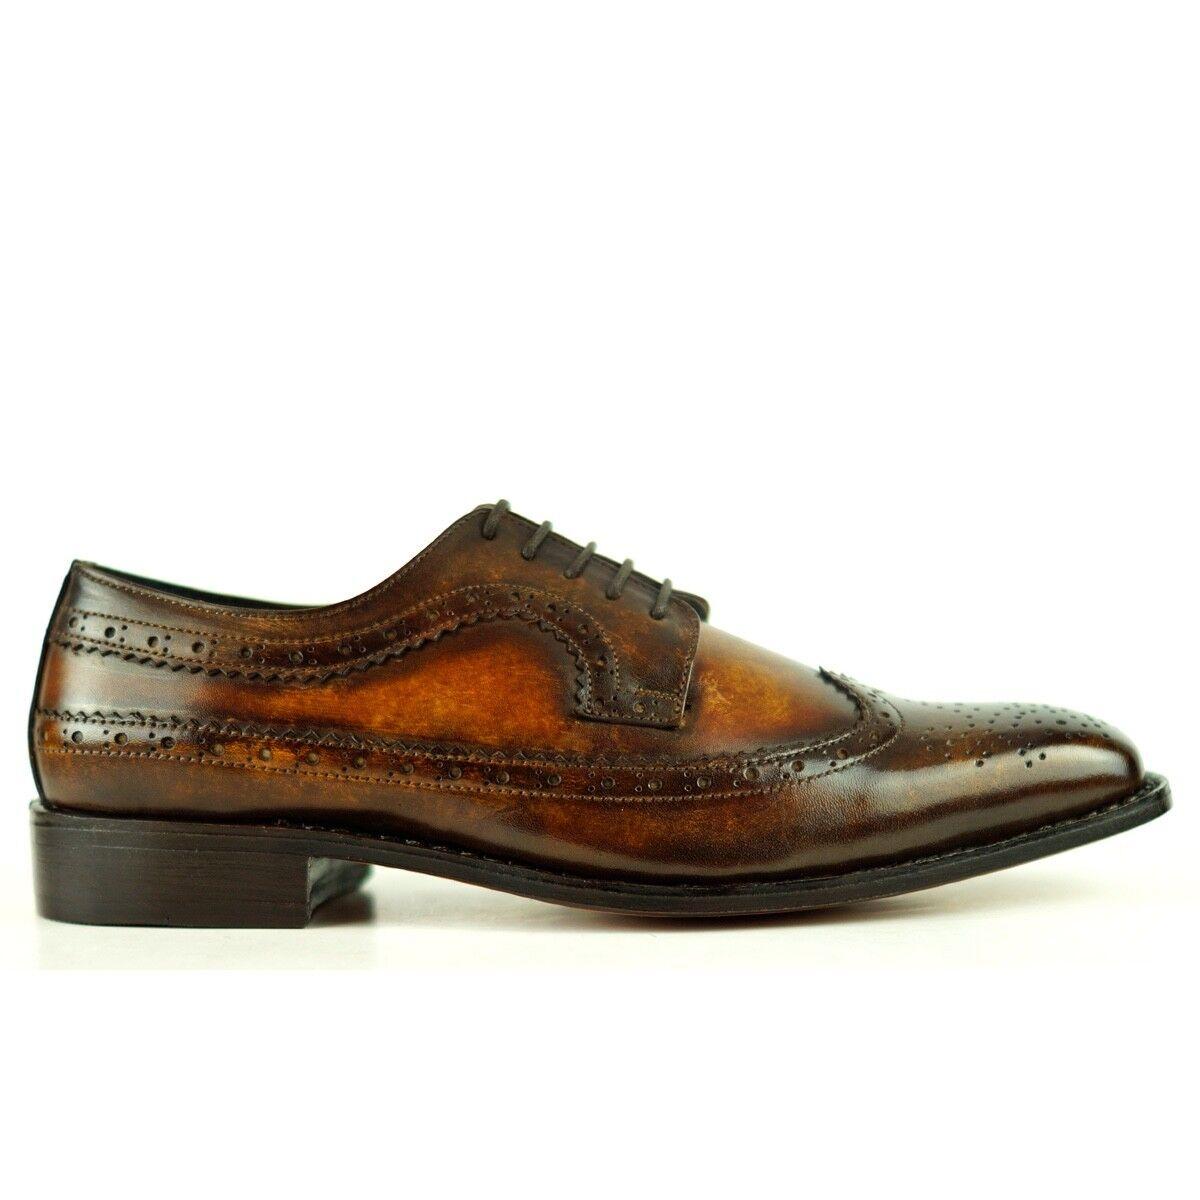 Zapatos de piel para hombre fabricación goodyear welted 2 tonos 9.5UK-44